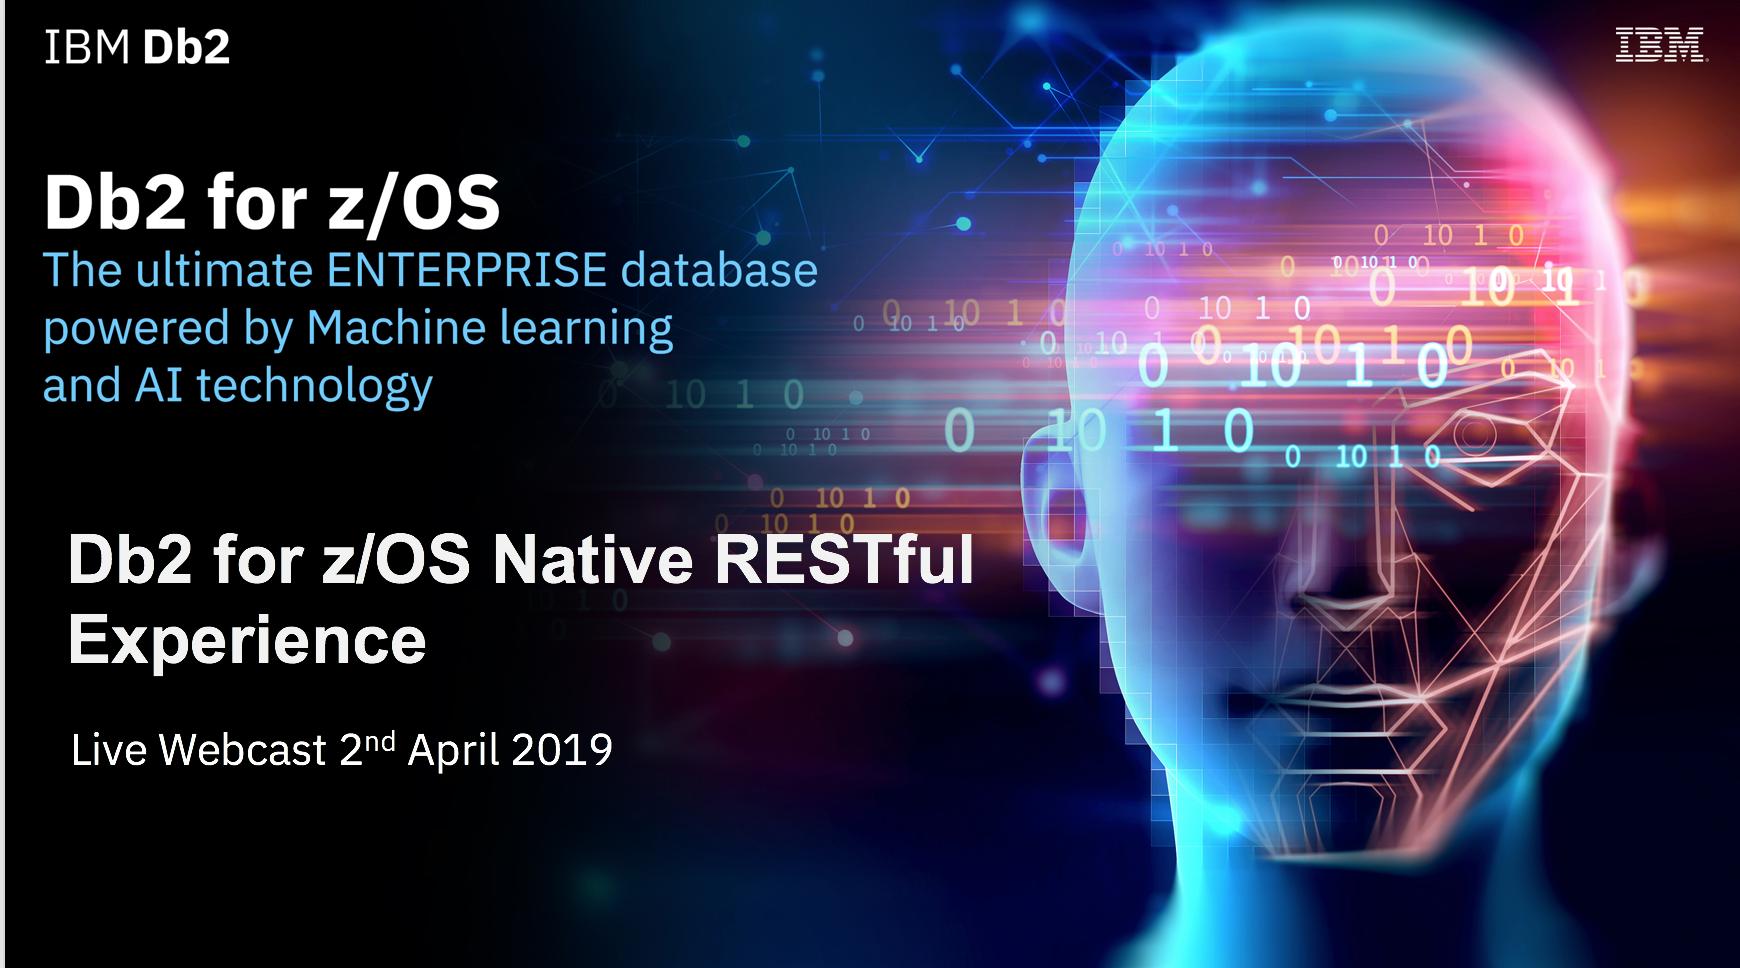 New News highlighting how Db2 for z/OS exploits RESTful Technology